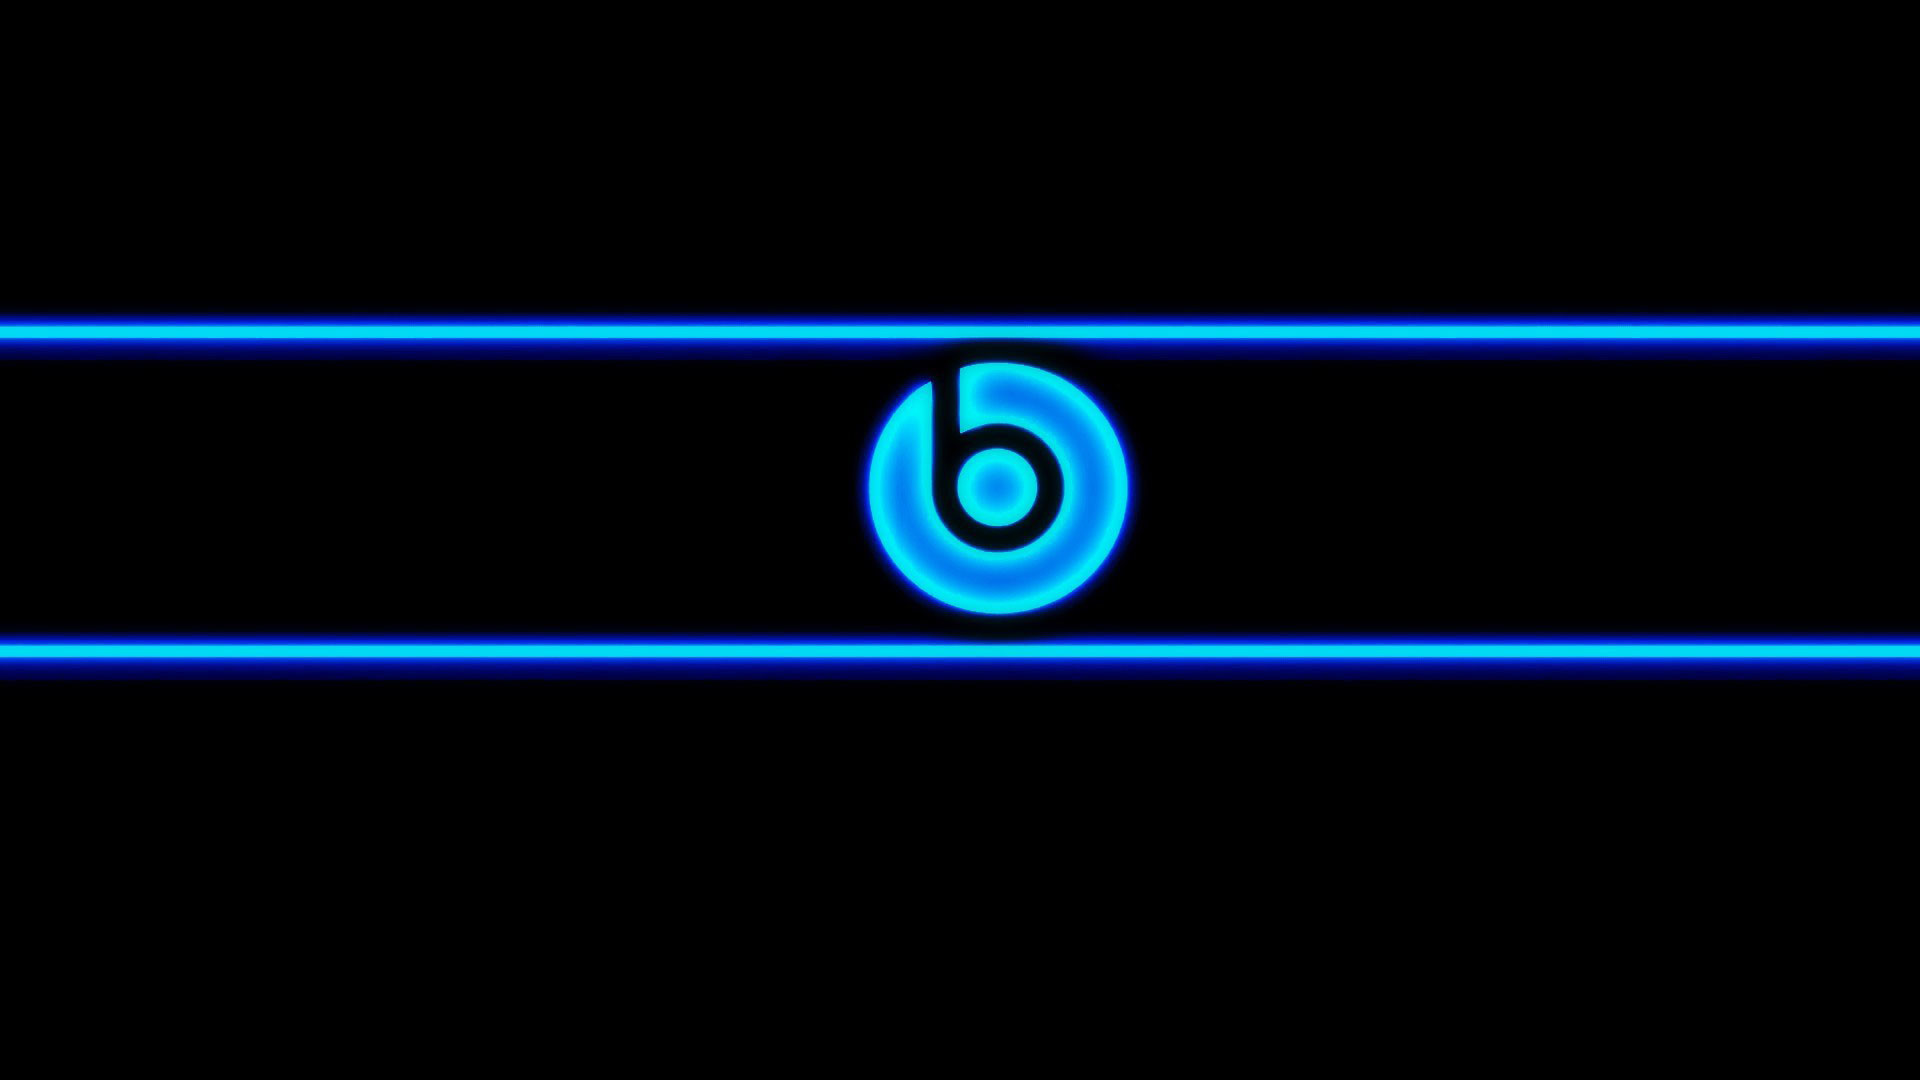 hd pics photos blue beats audio neon blue desktop background wallpaper